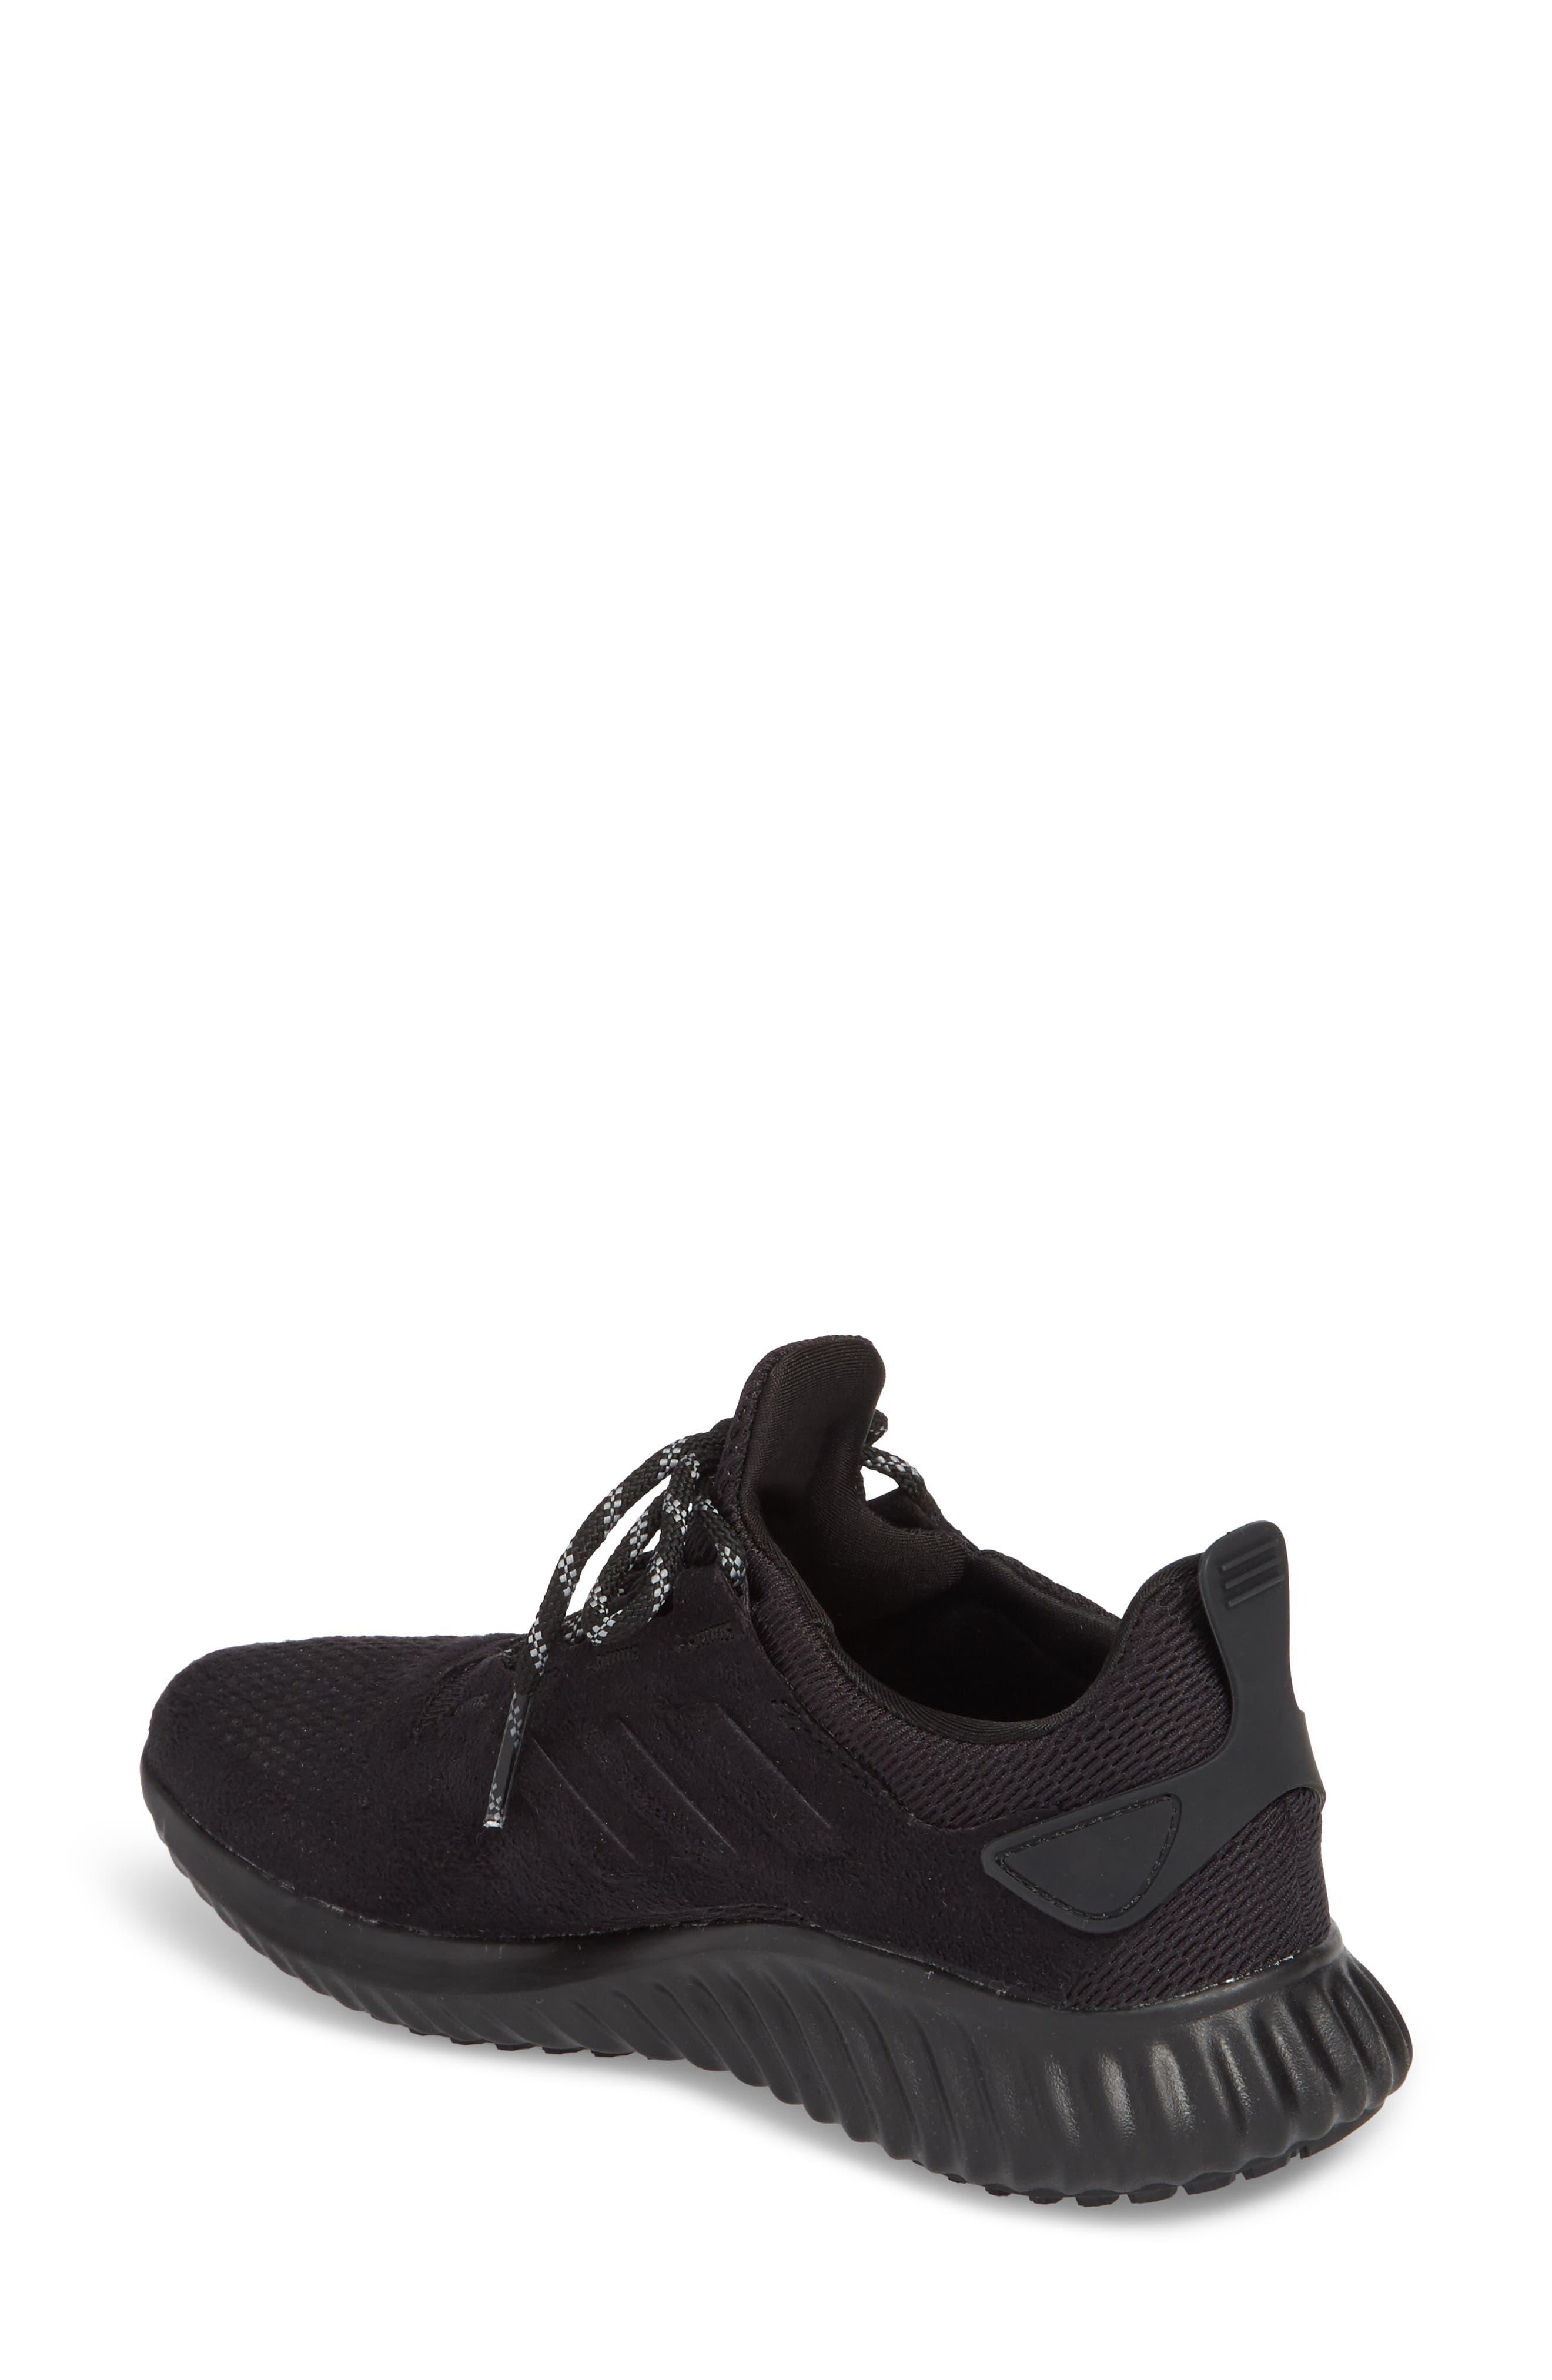 AlphaBounce CR Running Shoe,                             Alternate thumbnail 2, color,                             CORE BLACK/ CORE BLACK